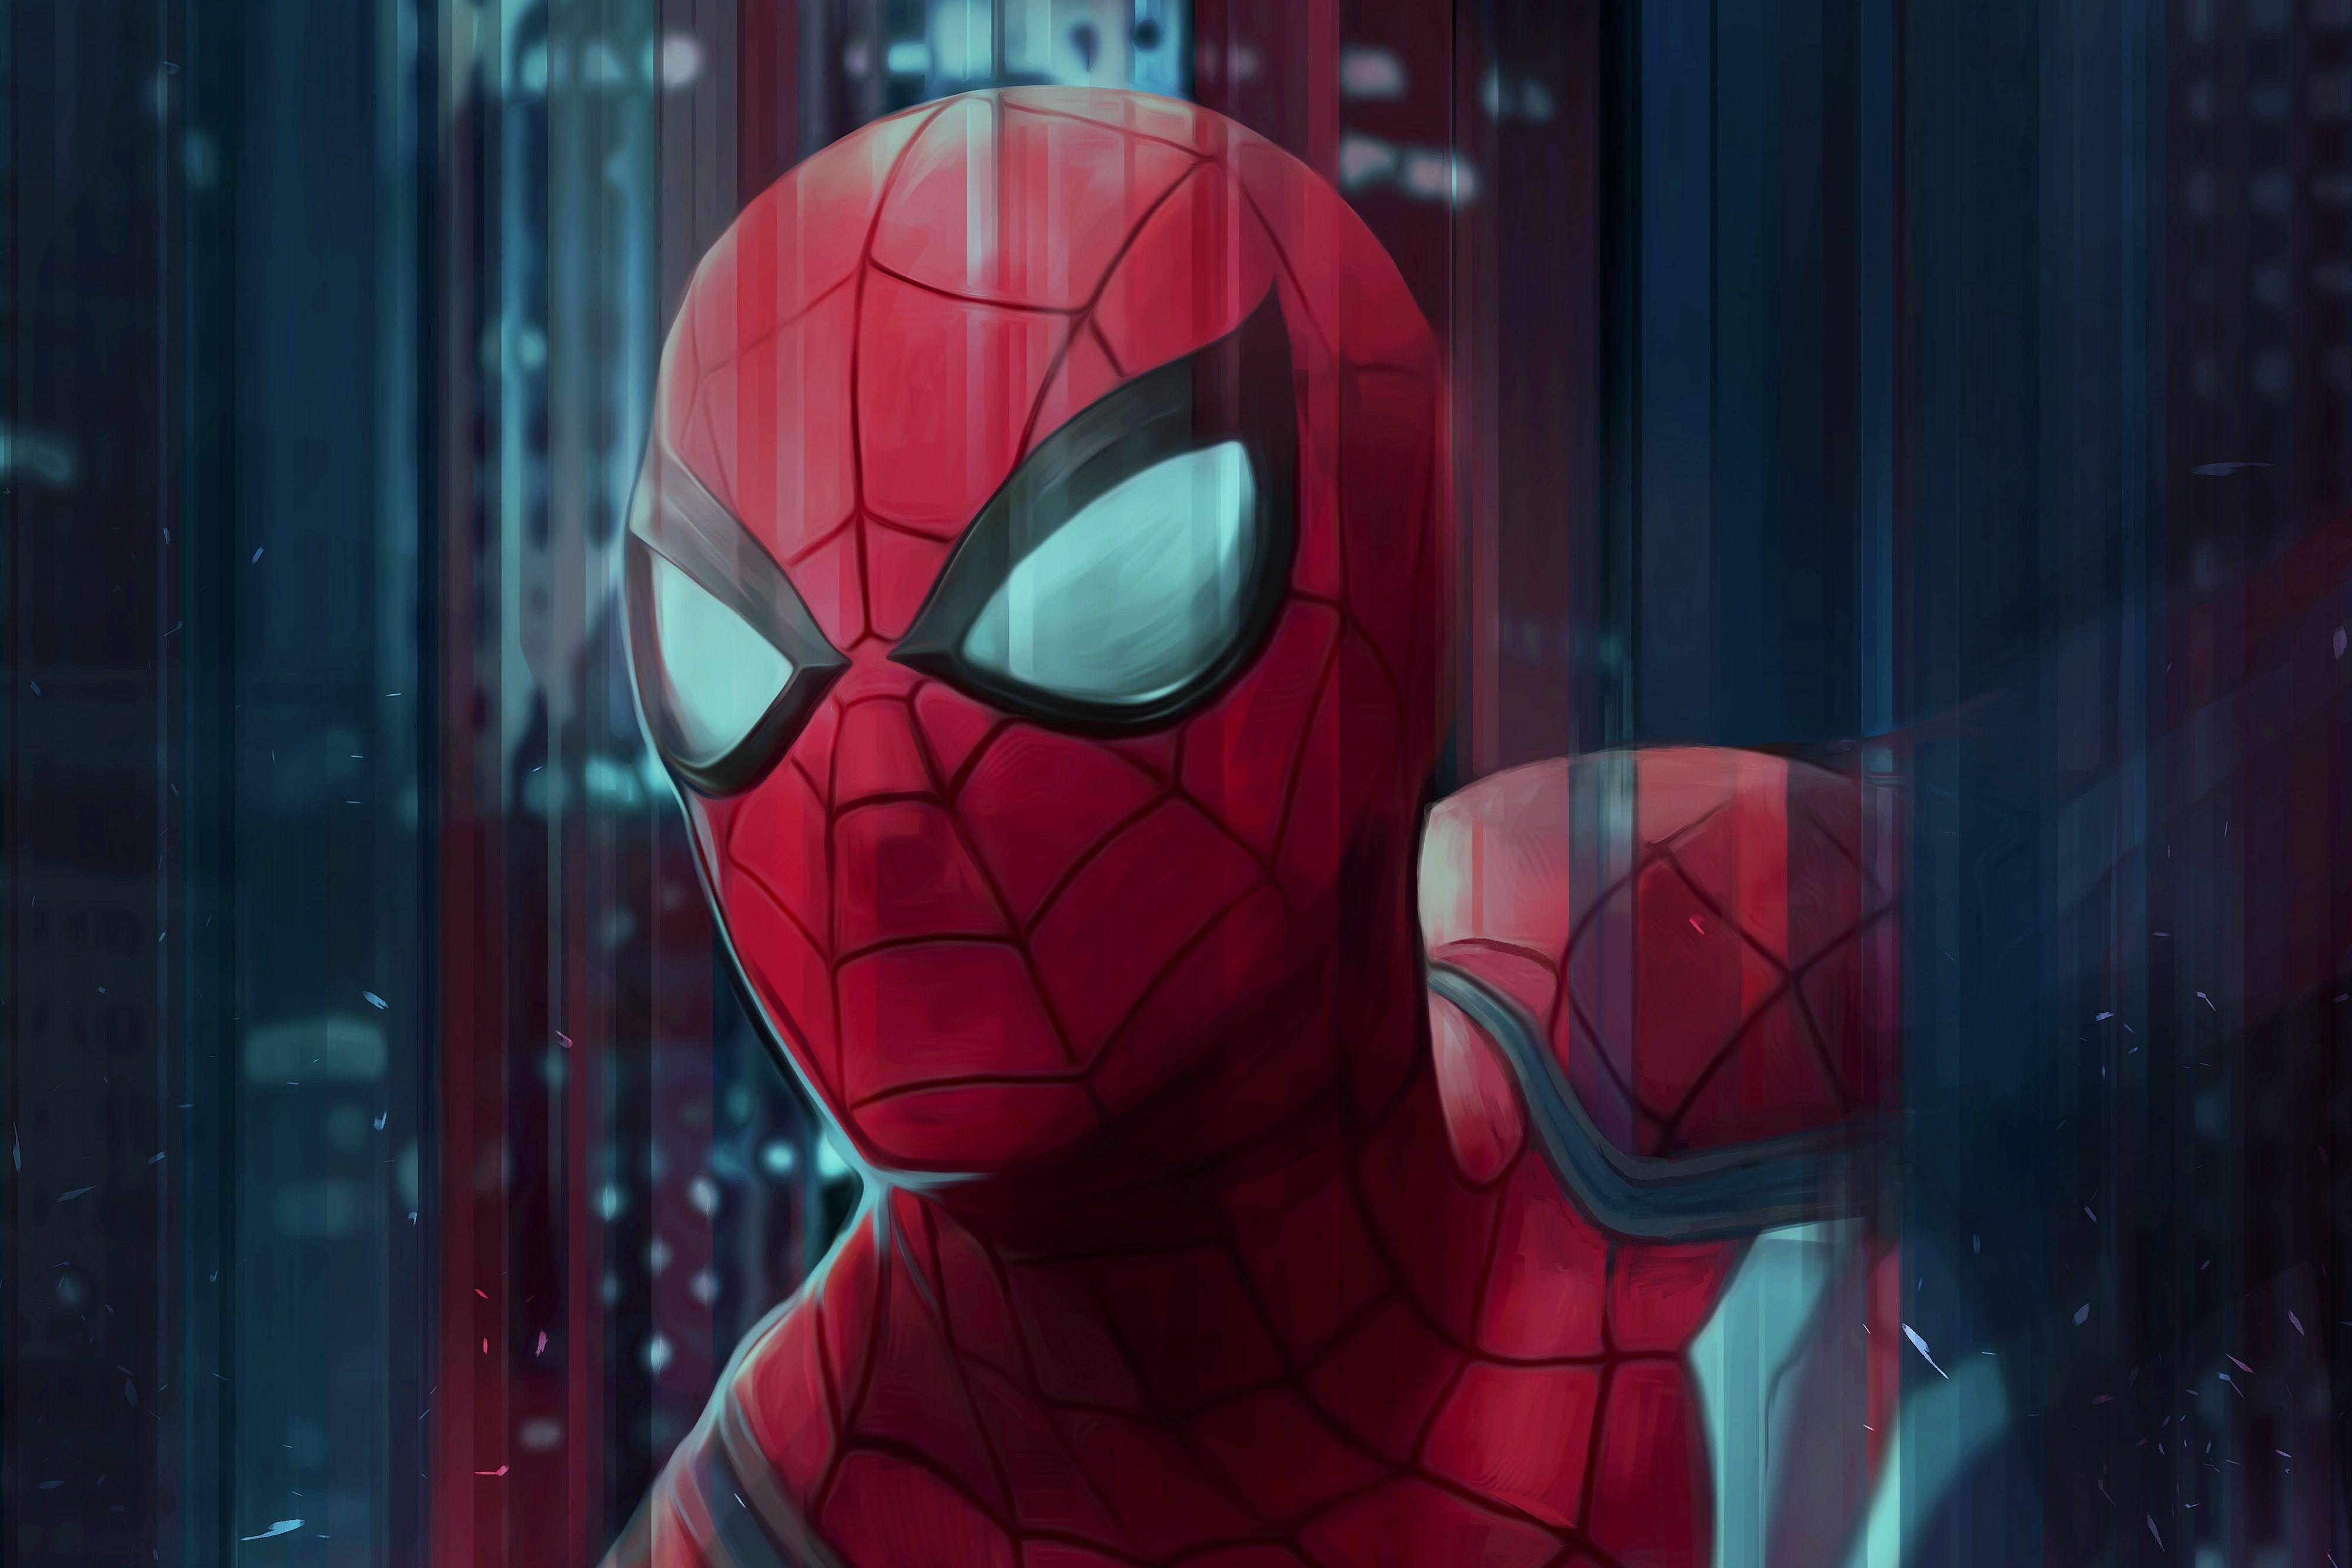 Wallpaper Spider Man Ps4 Hd 4k Games 3125 Spiderman Art Spiderman Artwork Spiderman